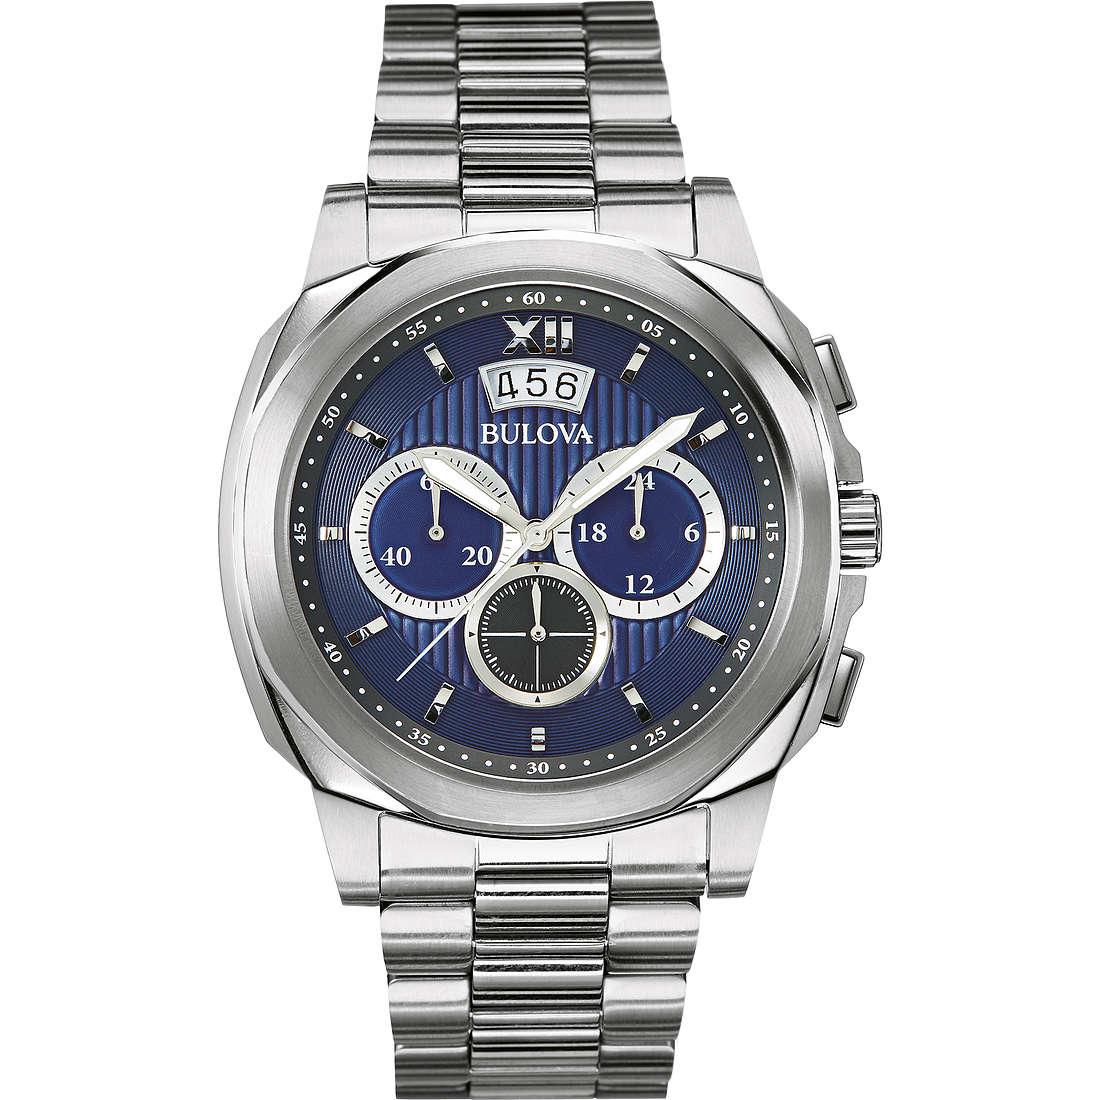 watch chronograph man Bulova Dress Cronografo 96B219